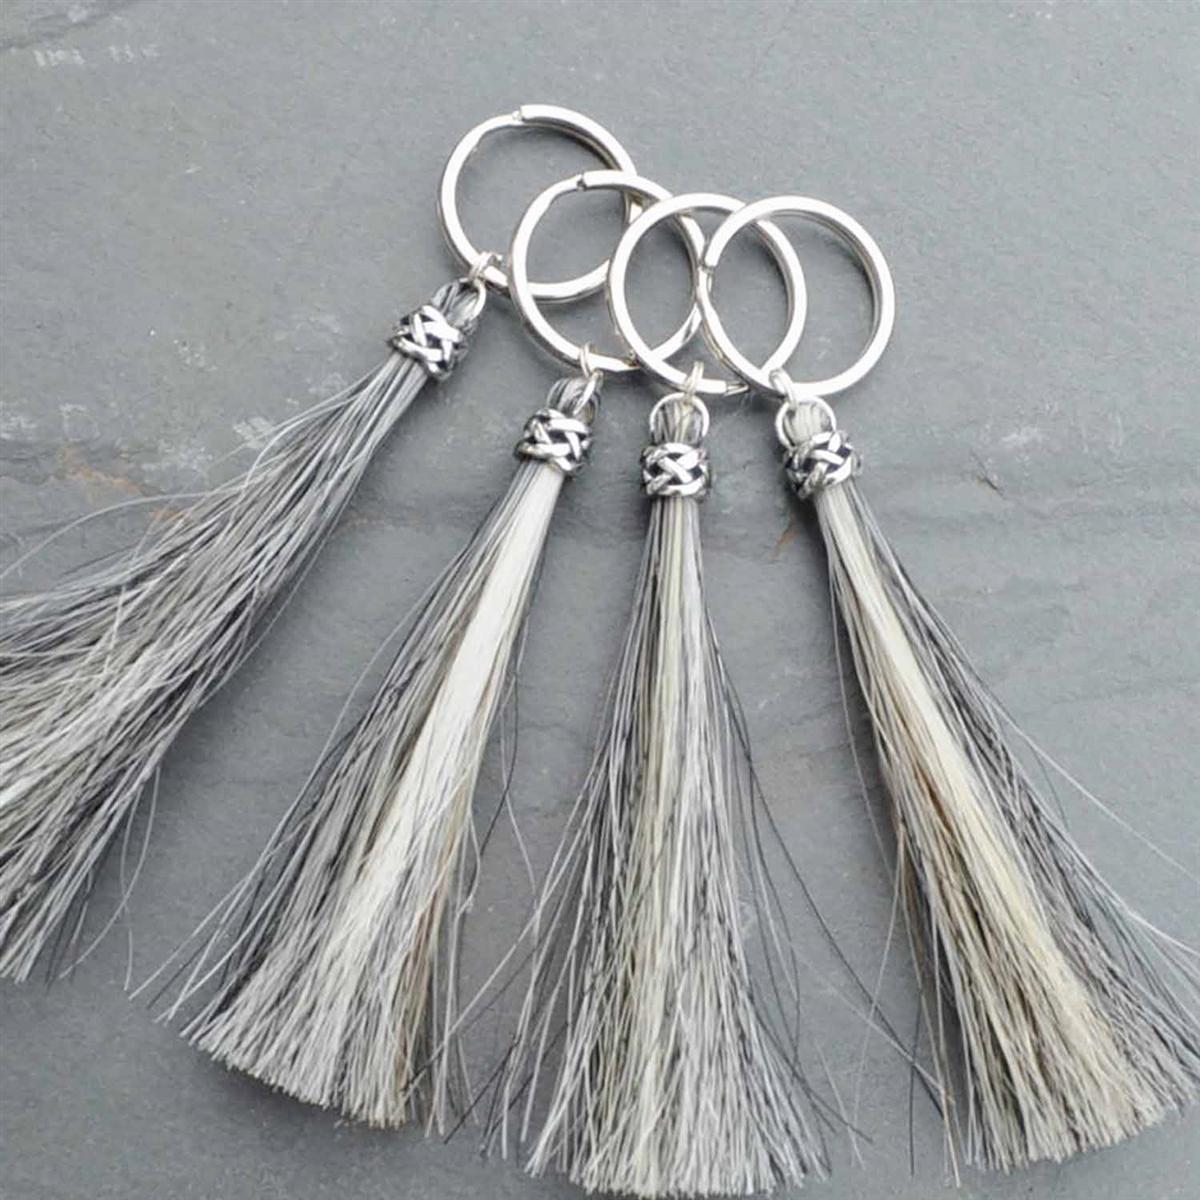 Spirithorse Designs Duncan Horse Hair Key Chain in sterling silver c0c76f866